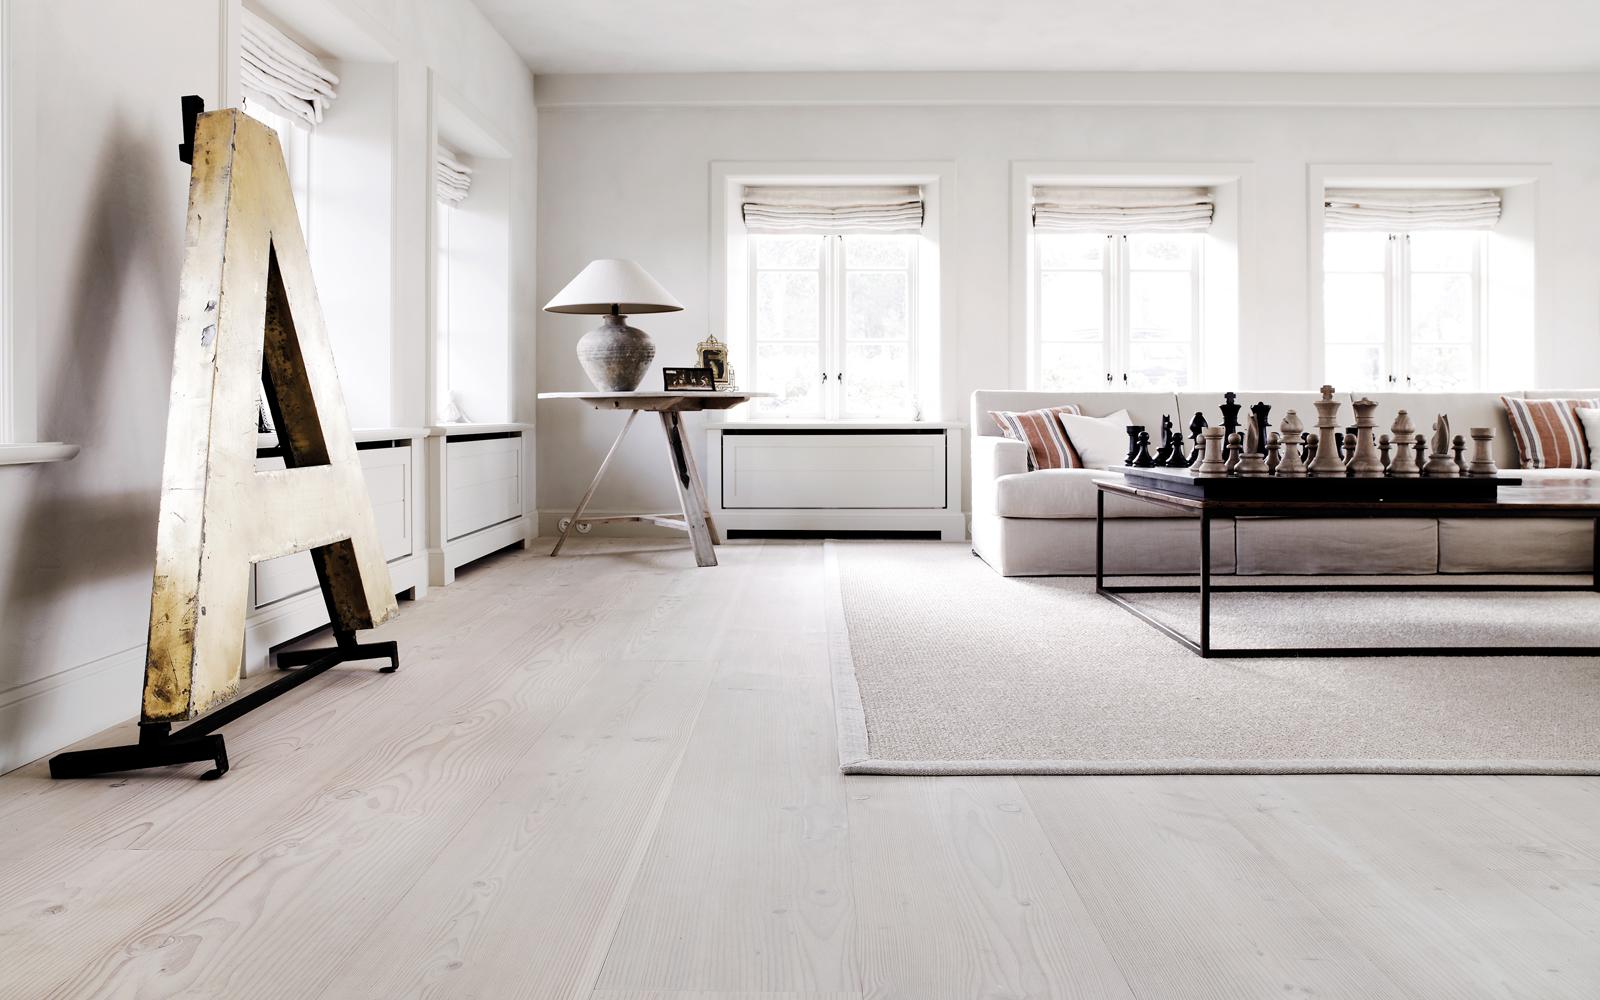 White Hardwood Floors Design Ideas - Home Design Ideas